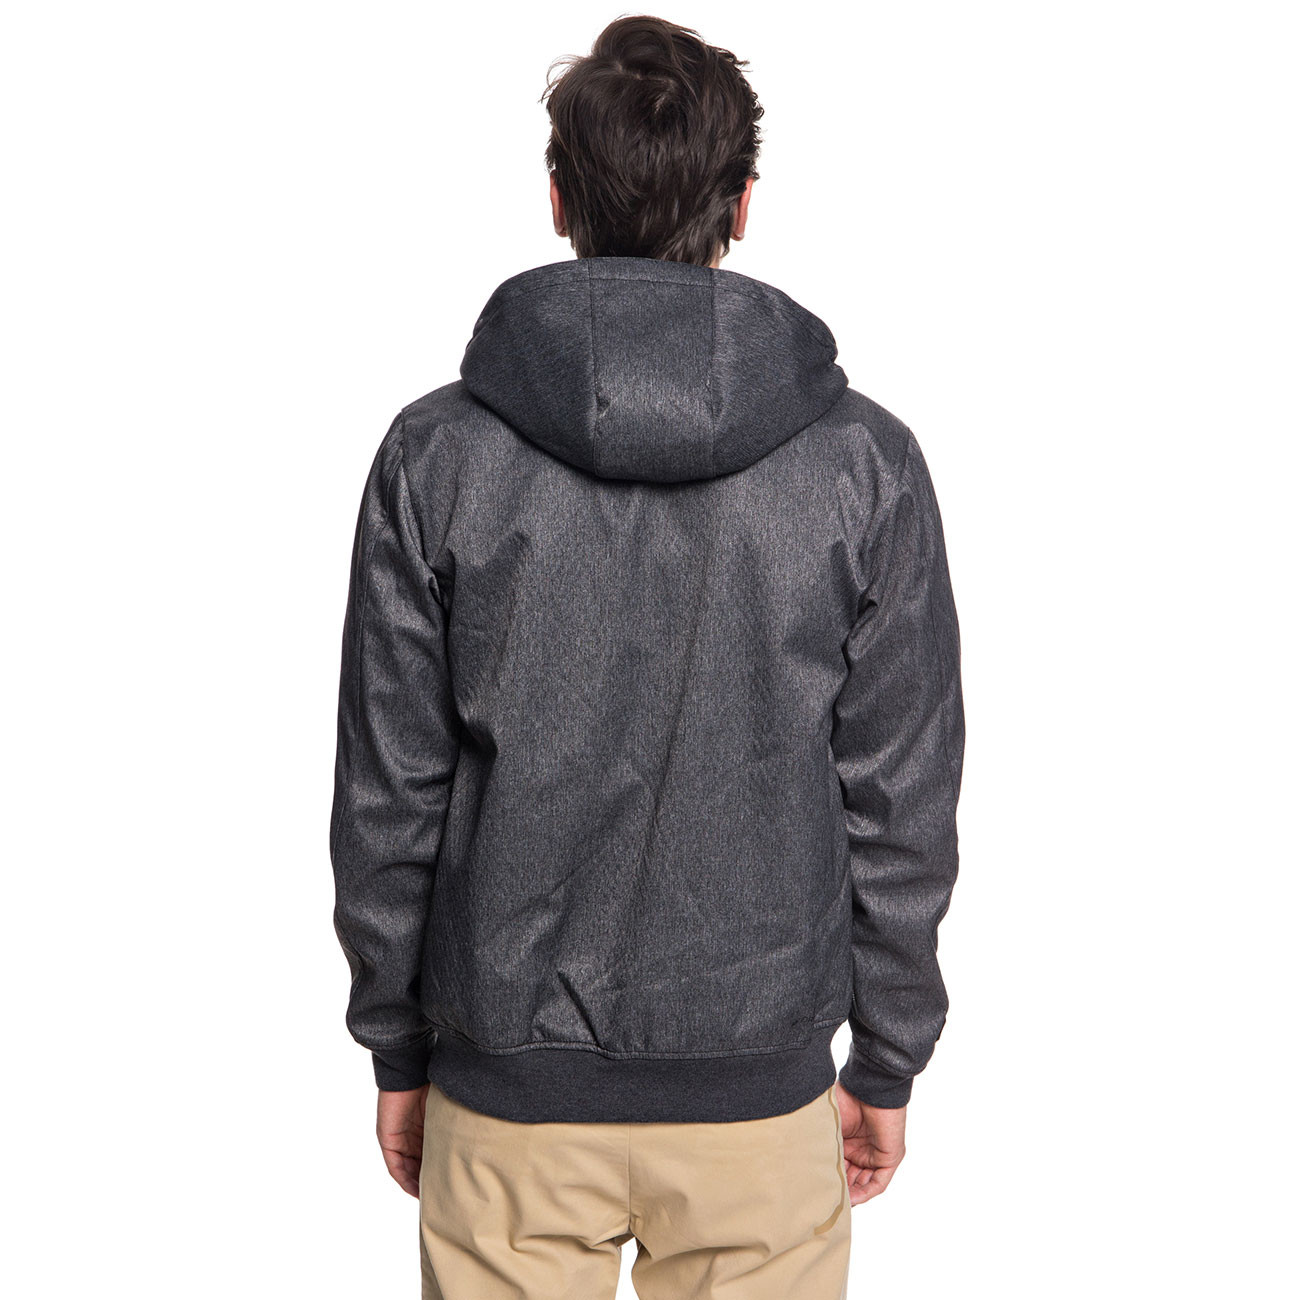 7fafe04a4840e Street jacket Quiksilver Brooks Bonded dark grey heather